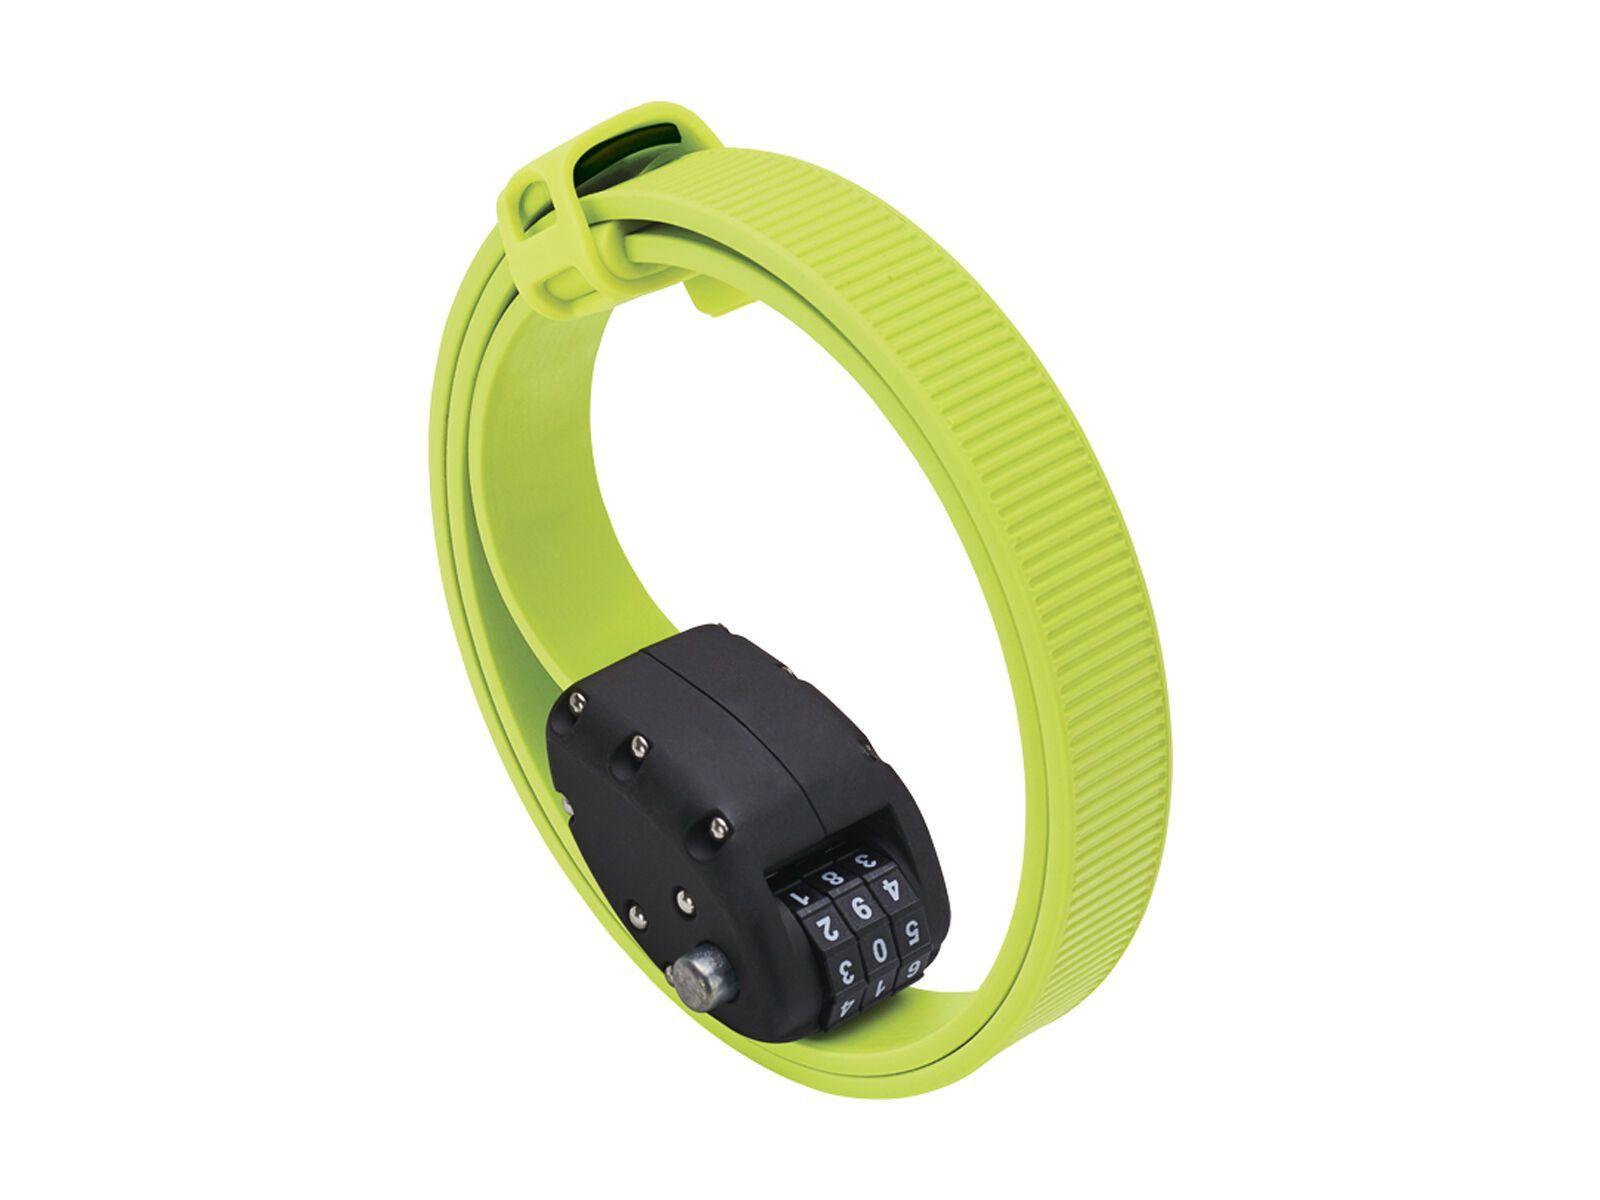 Otto DesignWorks Ottolock Cinch Lock - 76 cm, flash green - Fahrradschloss 202042